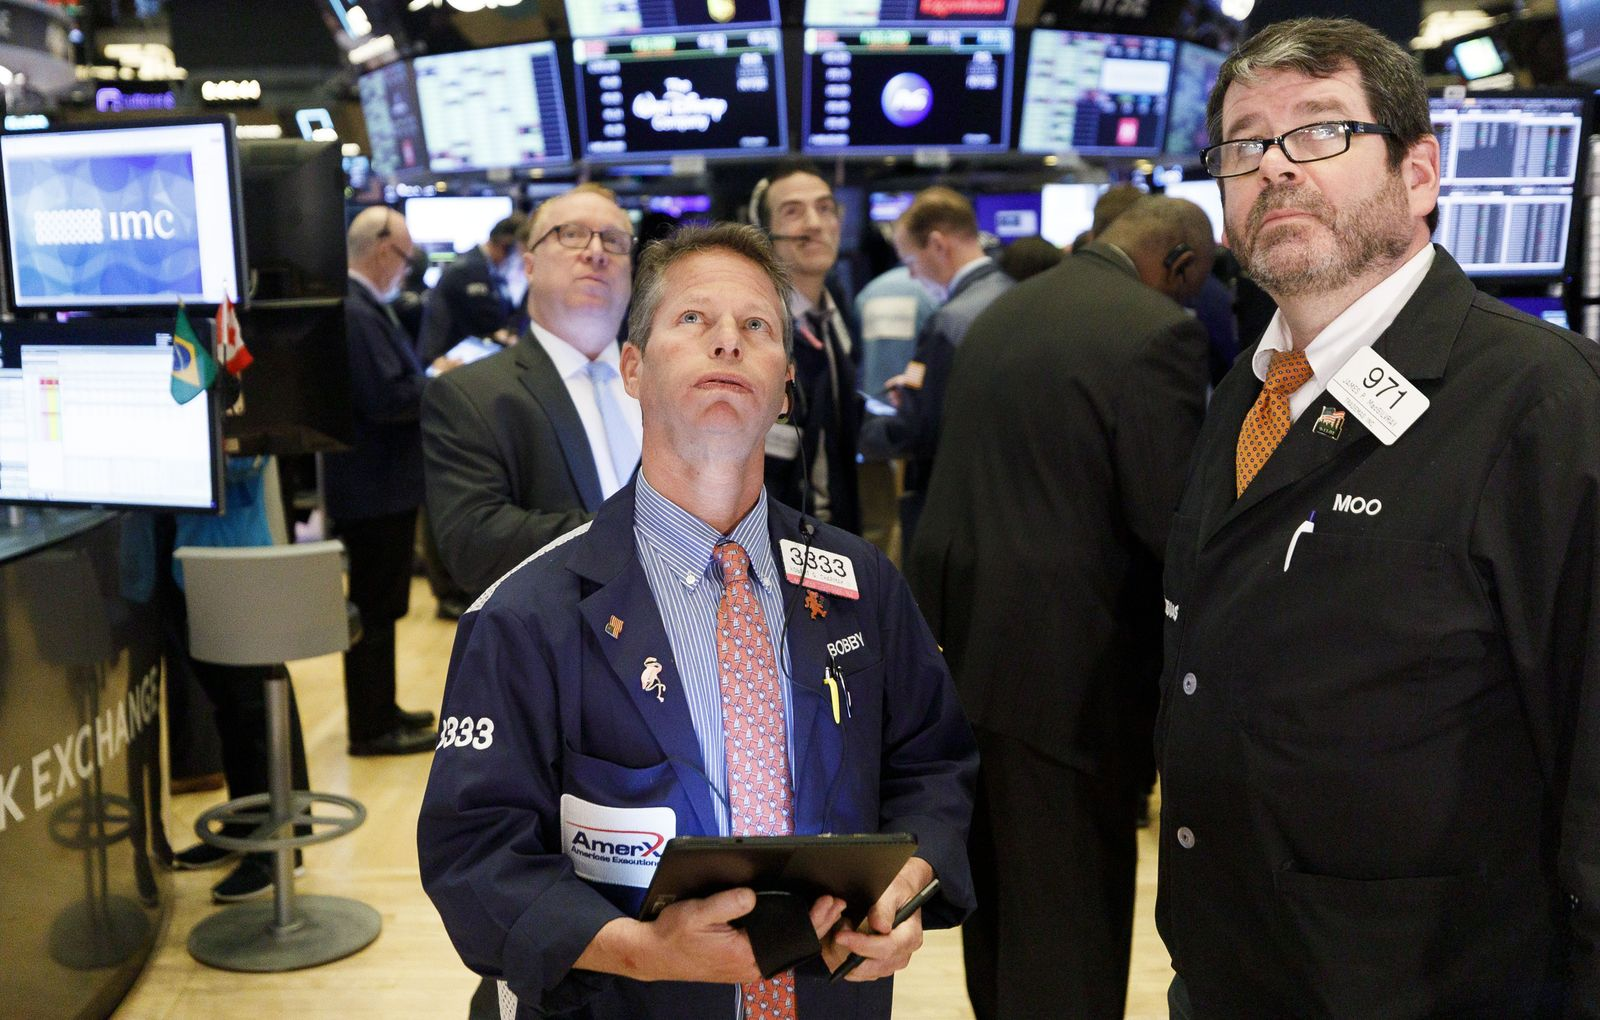 New York Stock Exchange Coronaviurus reaction, USA - 16 Mar 2020